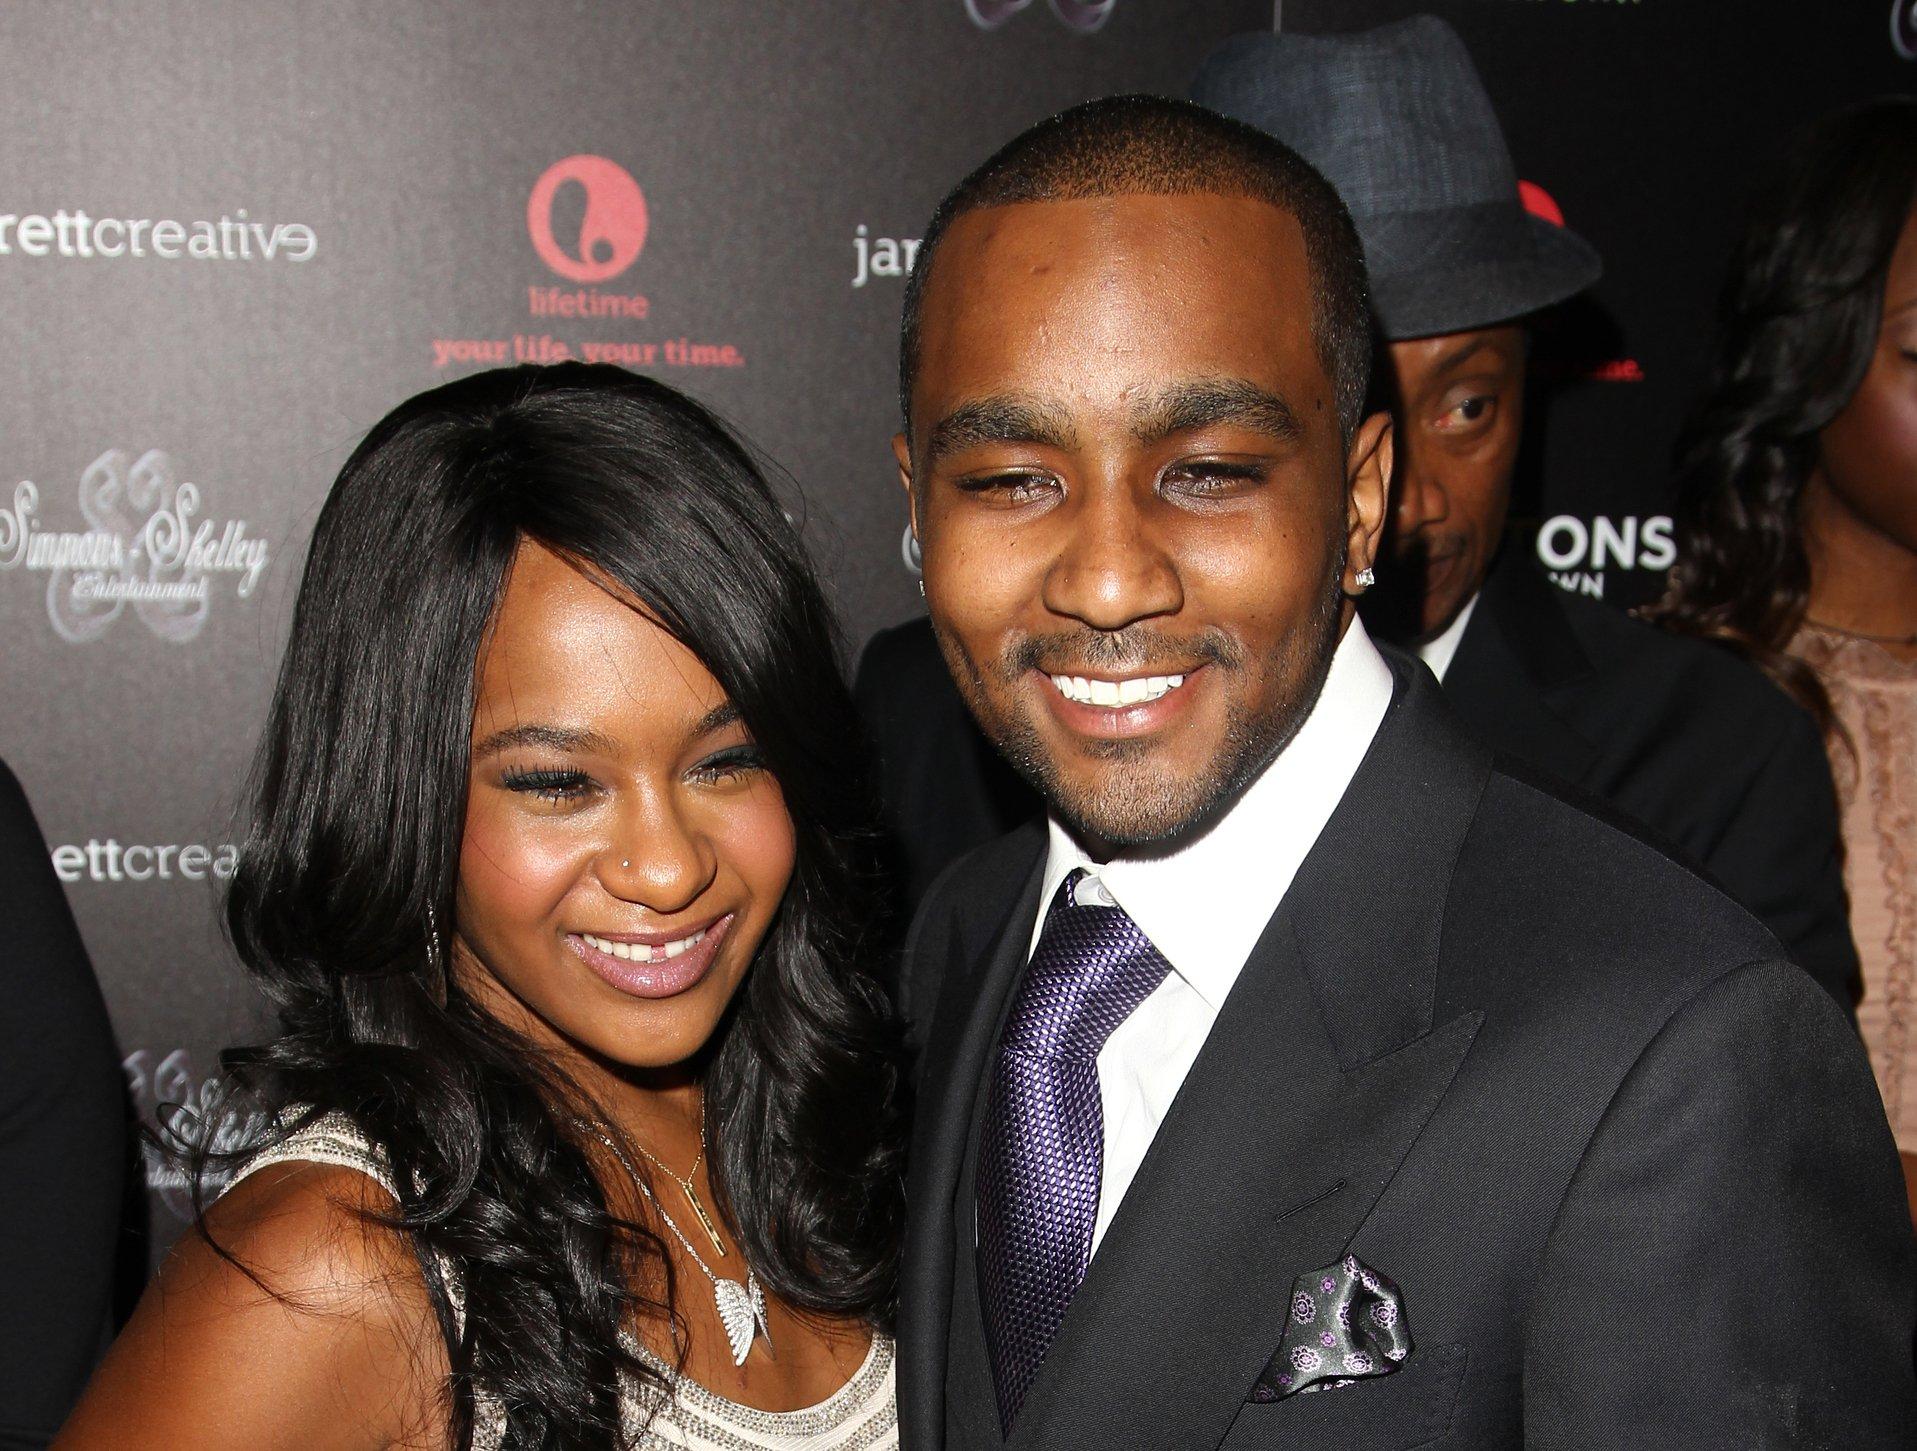 Brown's 30 Nick Bobbi Gordon At Dies Kristina Ex-partner